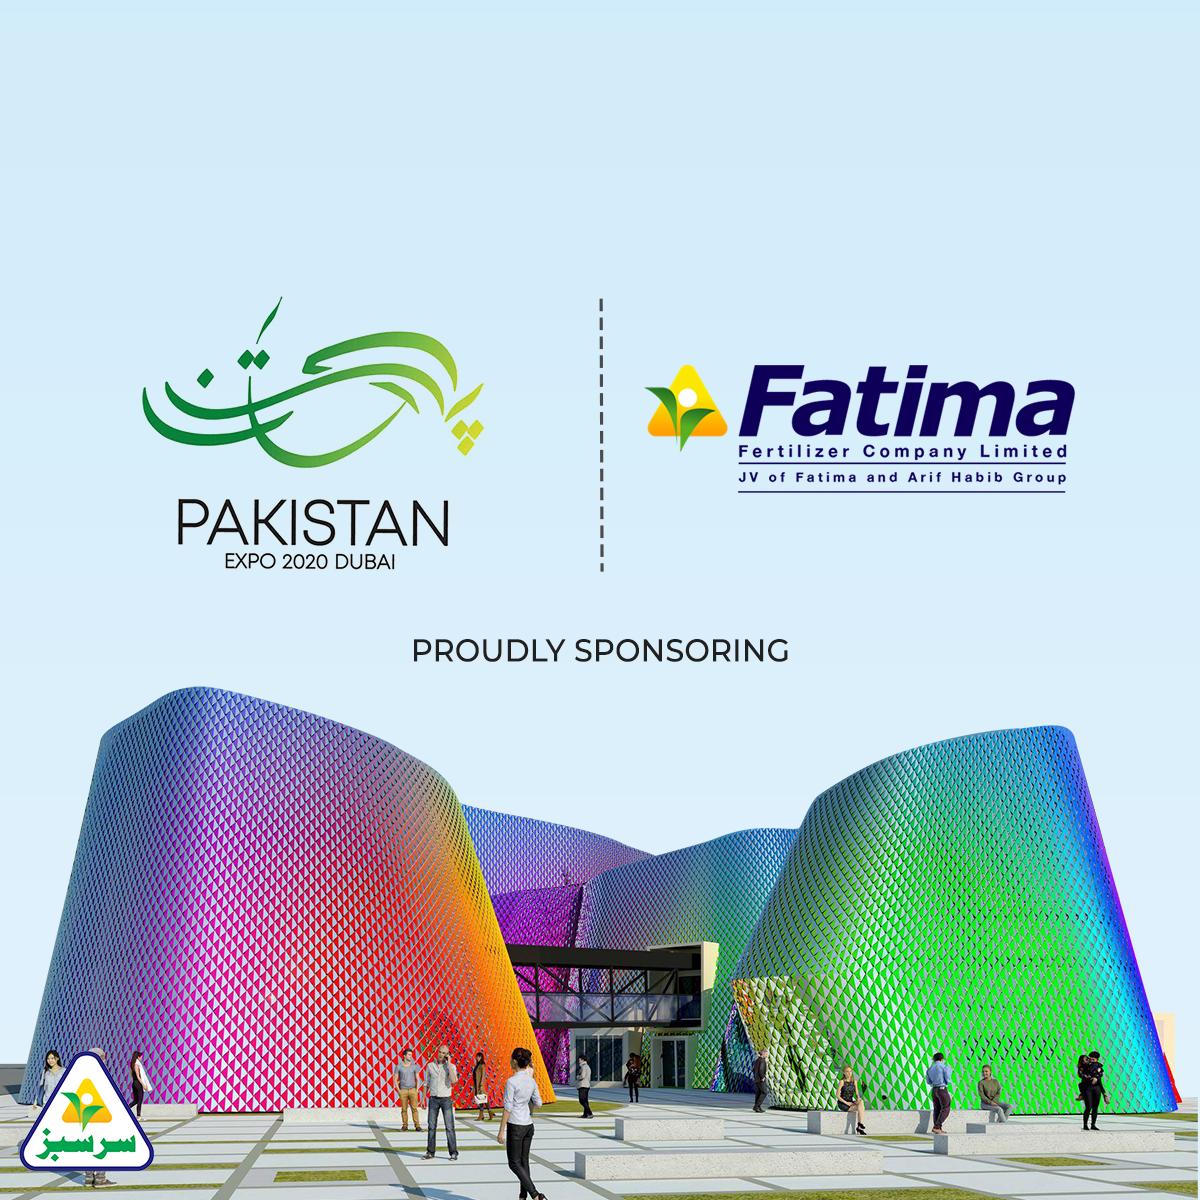 سپورٹنگ ایکسپو 2020 دبئی پاکستان پویلین